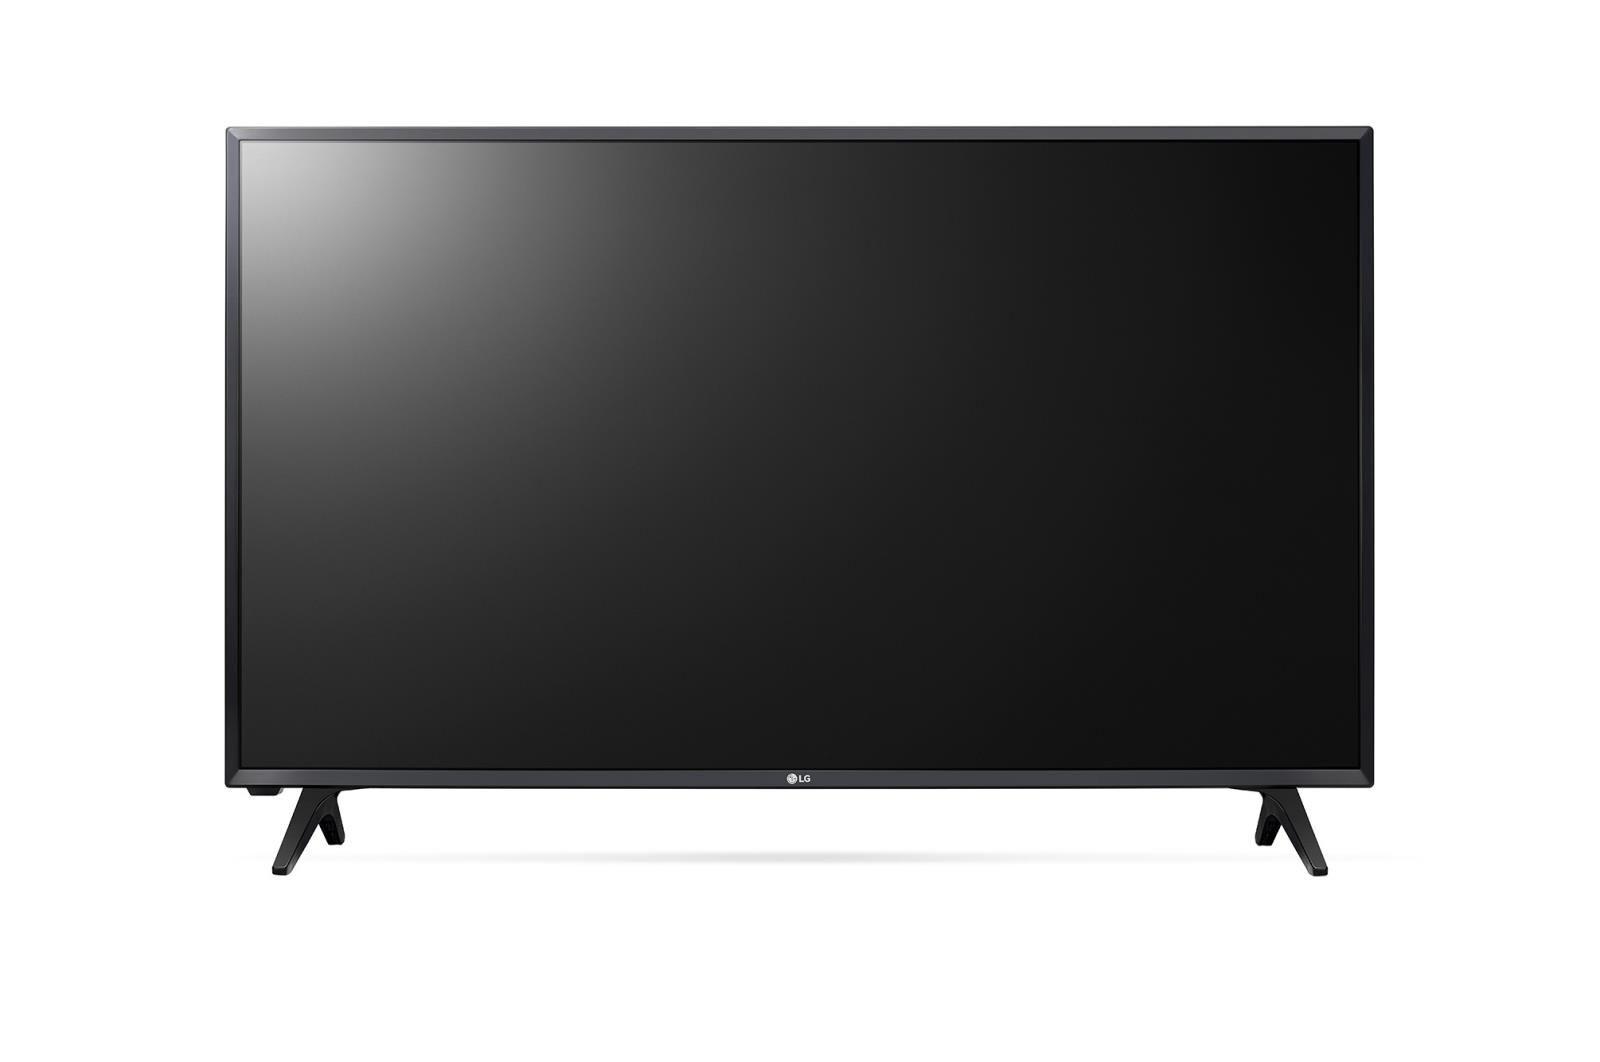 LG 32LK500 Tv Led 32'' hd Ready Usb